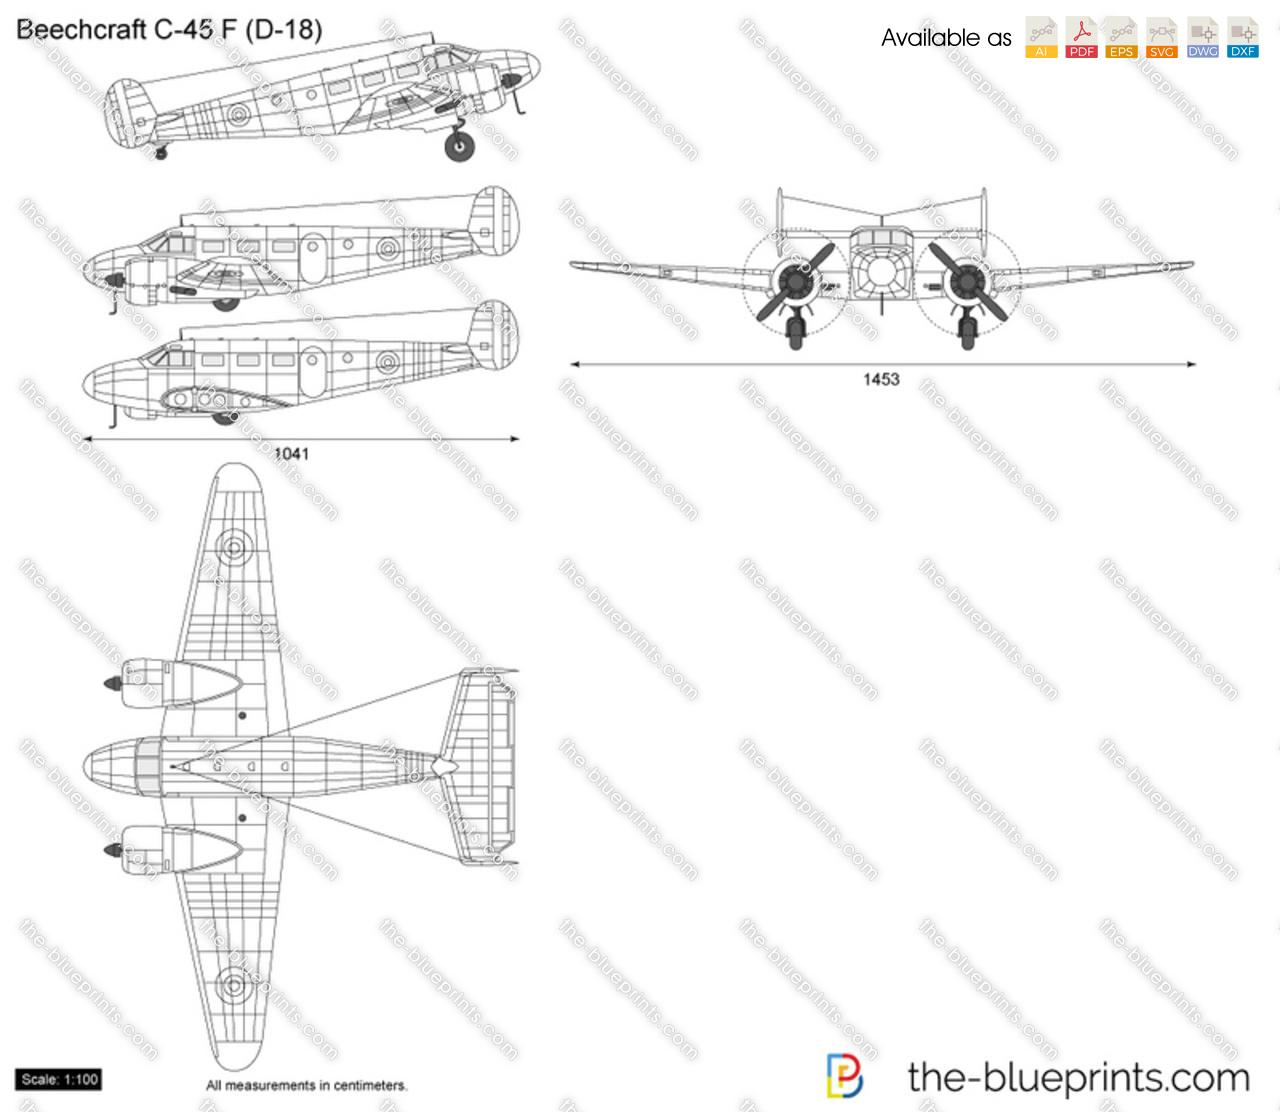 Beechcraft C-45 F (D-18)